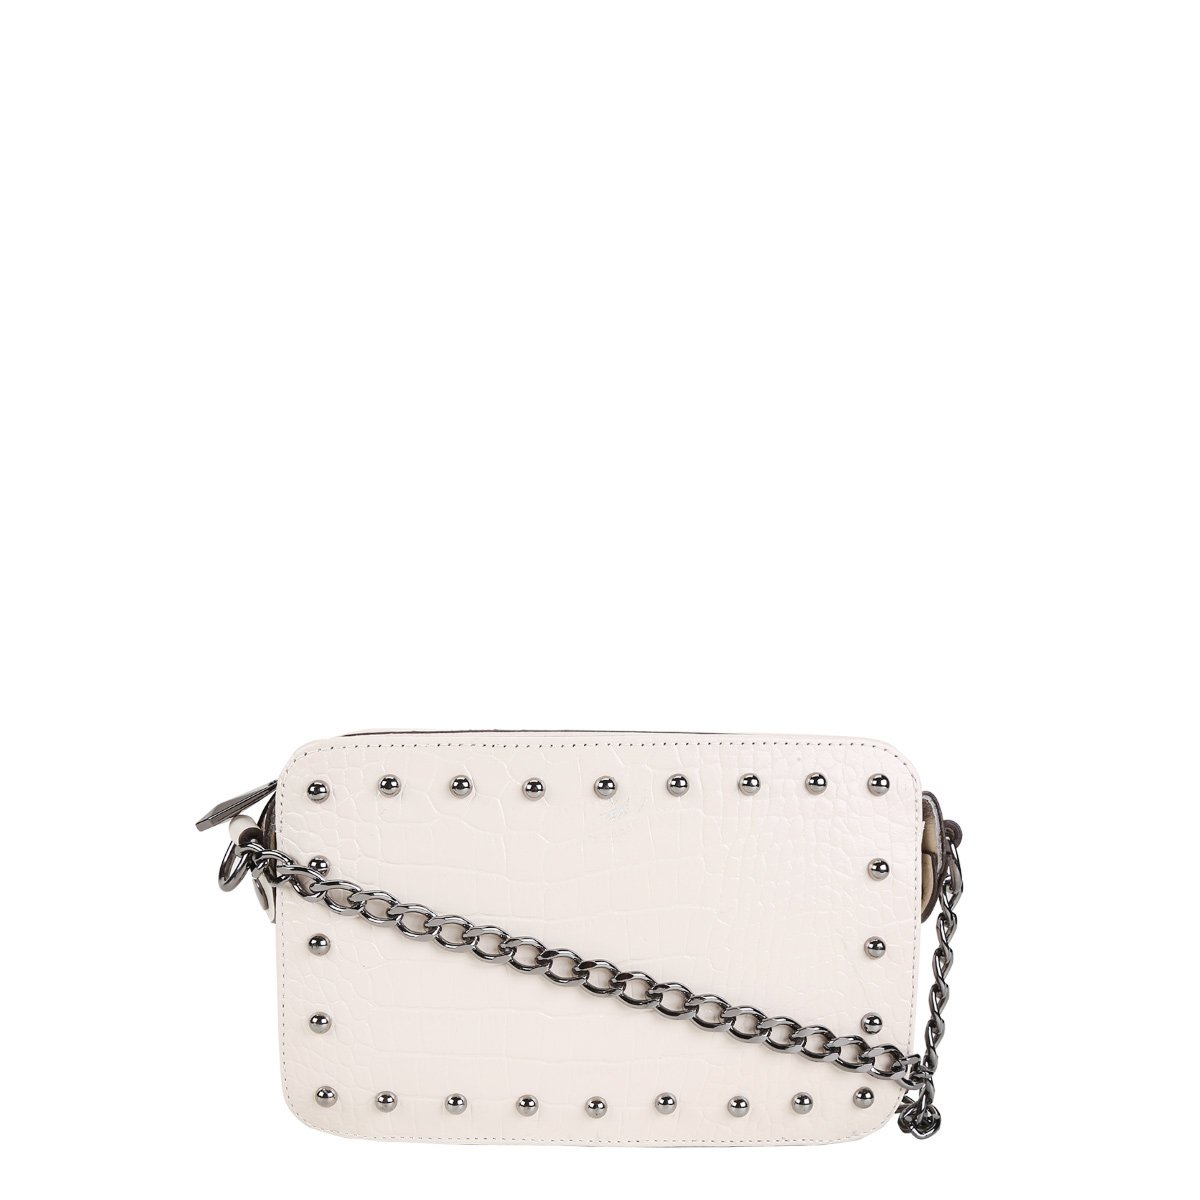 bfa19671086 Bolsa Couro Shoestock Mini Bag Tachas Feminina | Shoestock